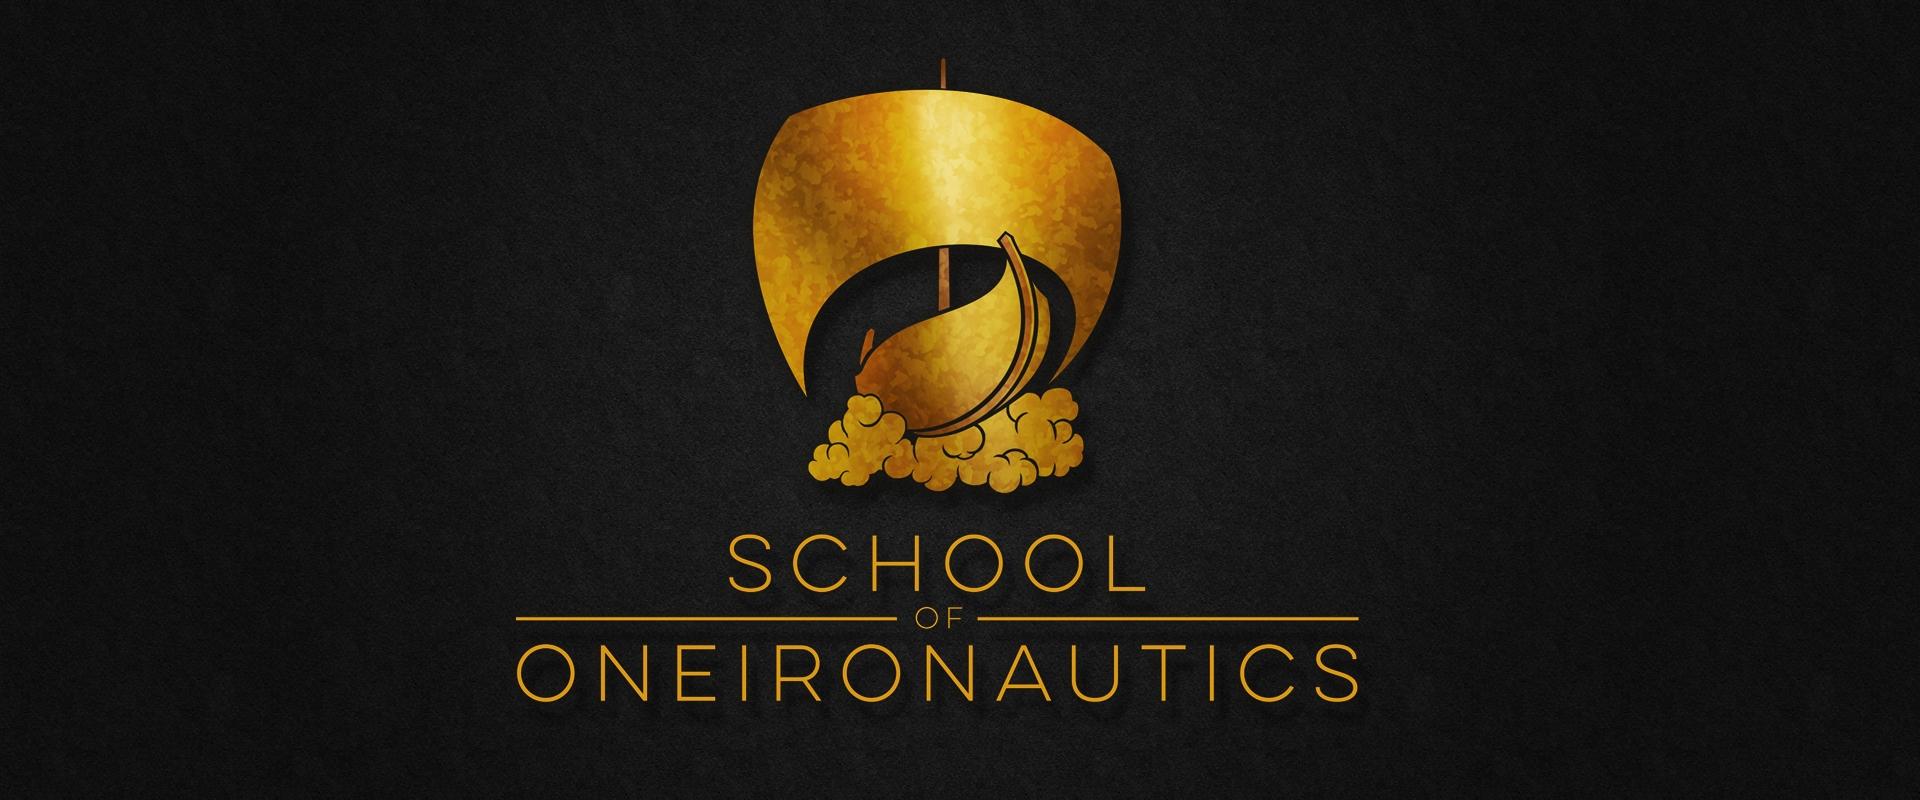 School of Oneironautics